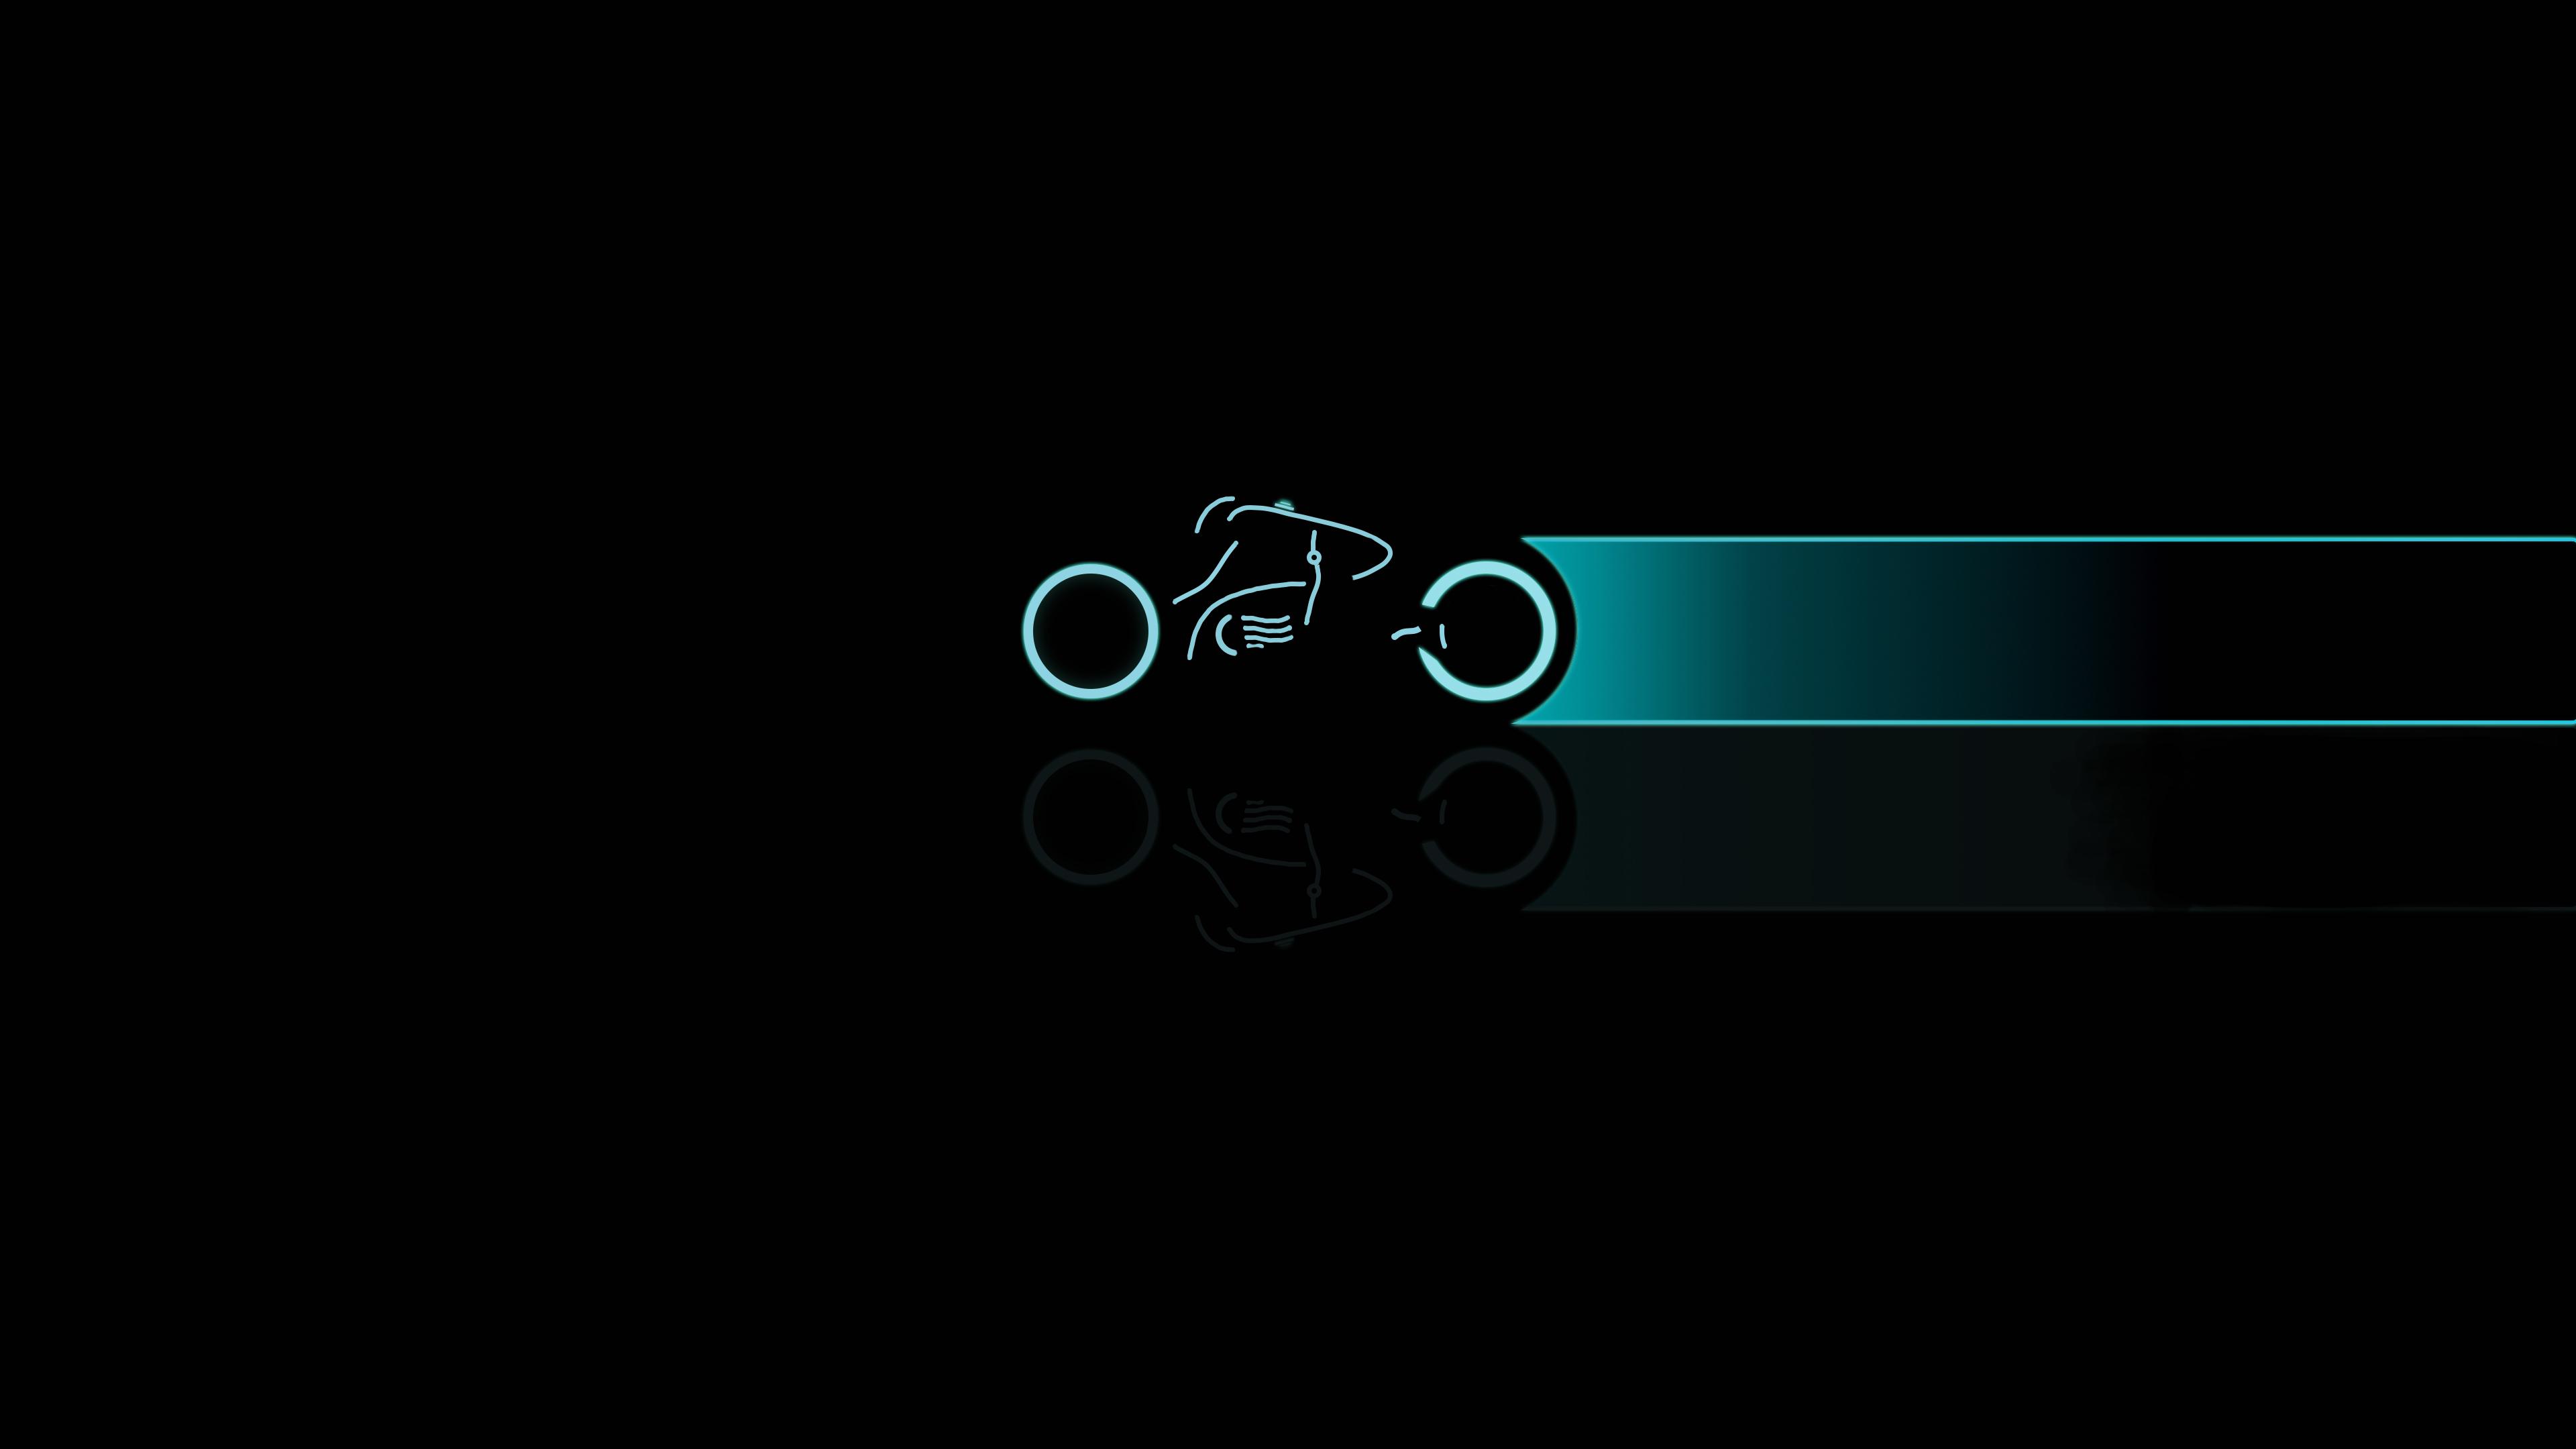 3840x2160 Tron Motorcycle 4K Wallpaper, HD Movies 4K ...